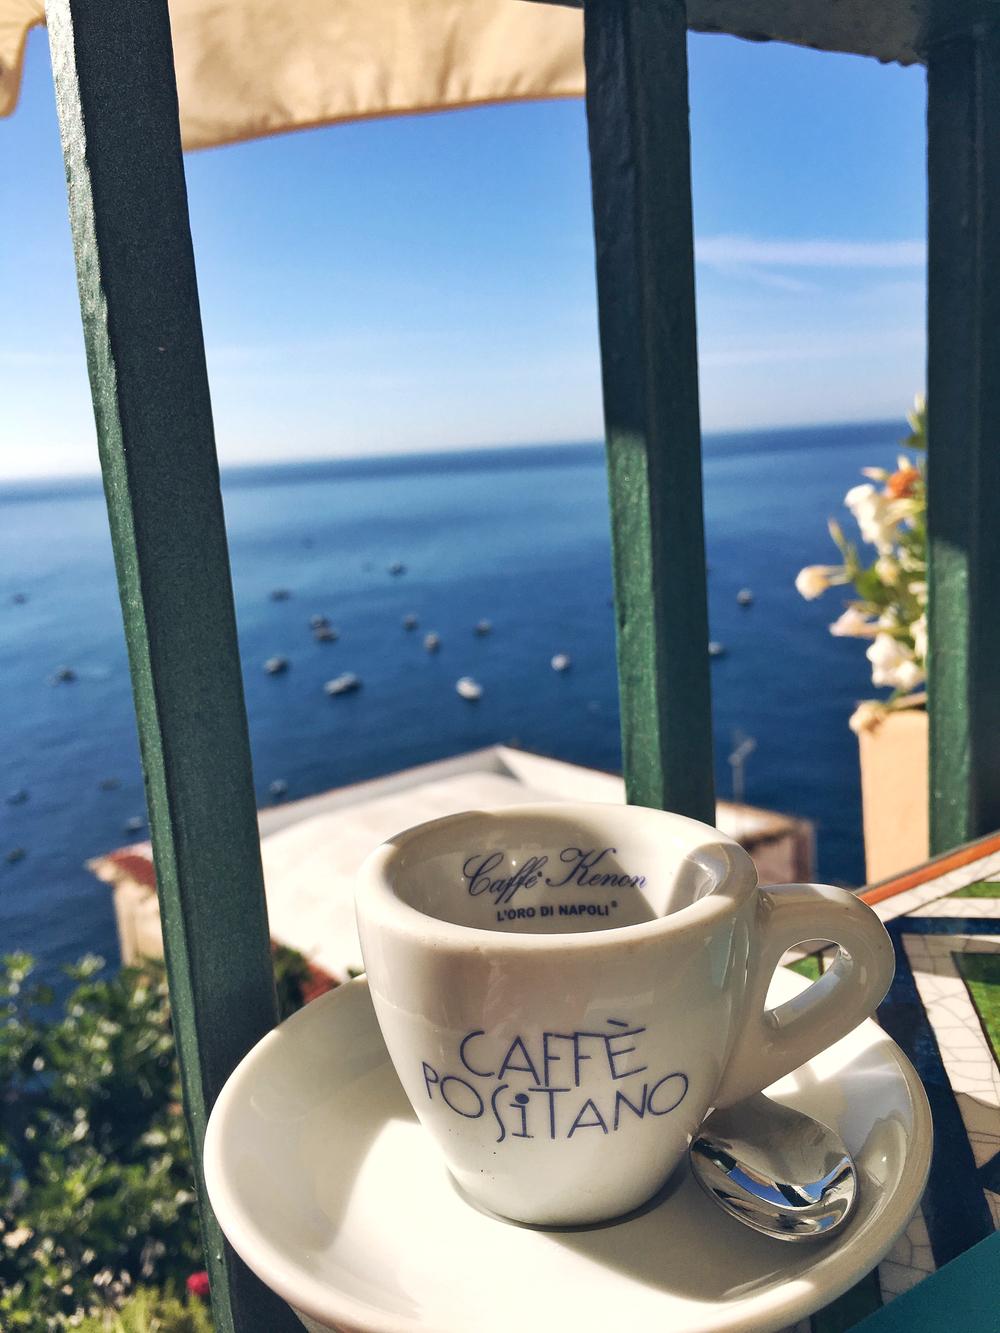 Traditional Italian Coffee - Cafe Positano